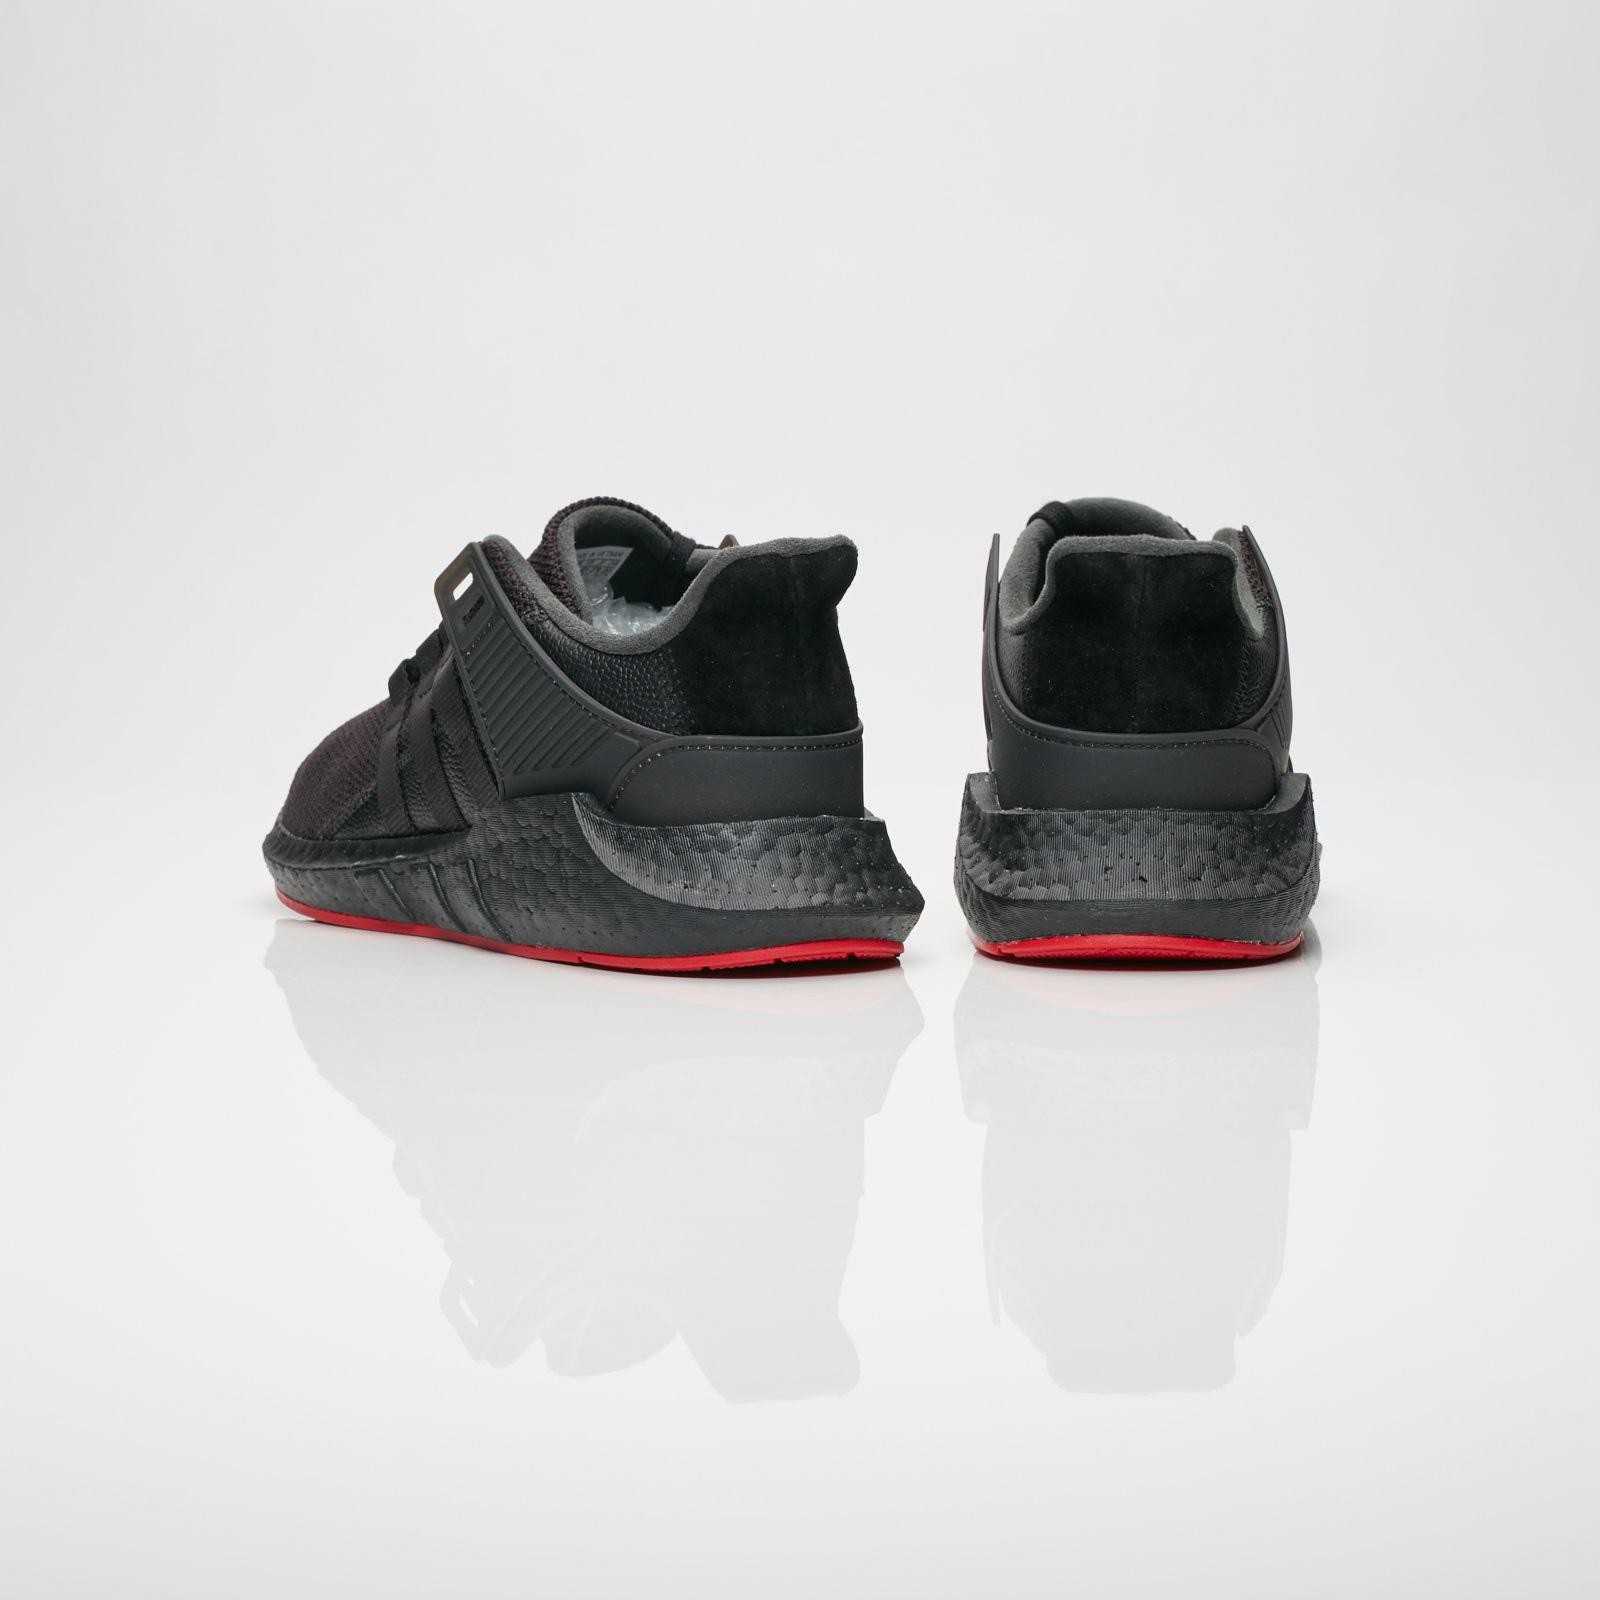 6940e773c5e9 adidas EQT Support 93 17 - Cq2394 - Sneakersnstuff